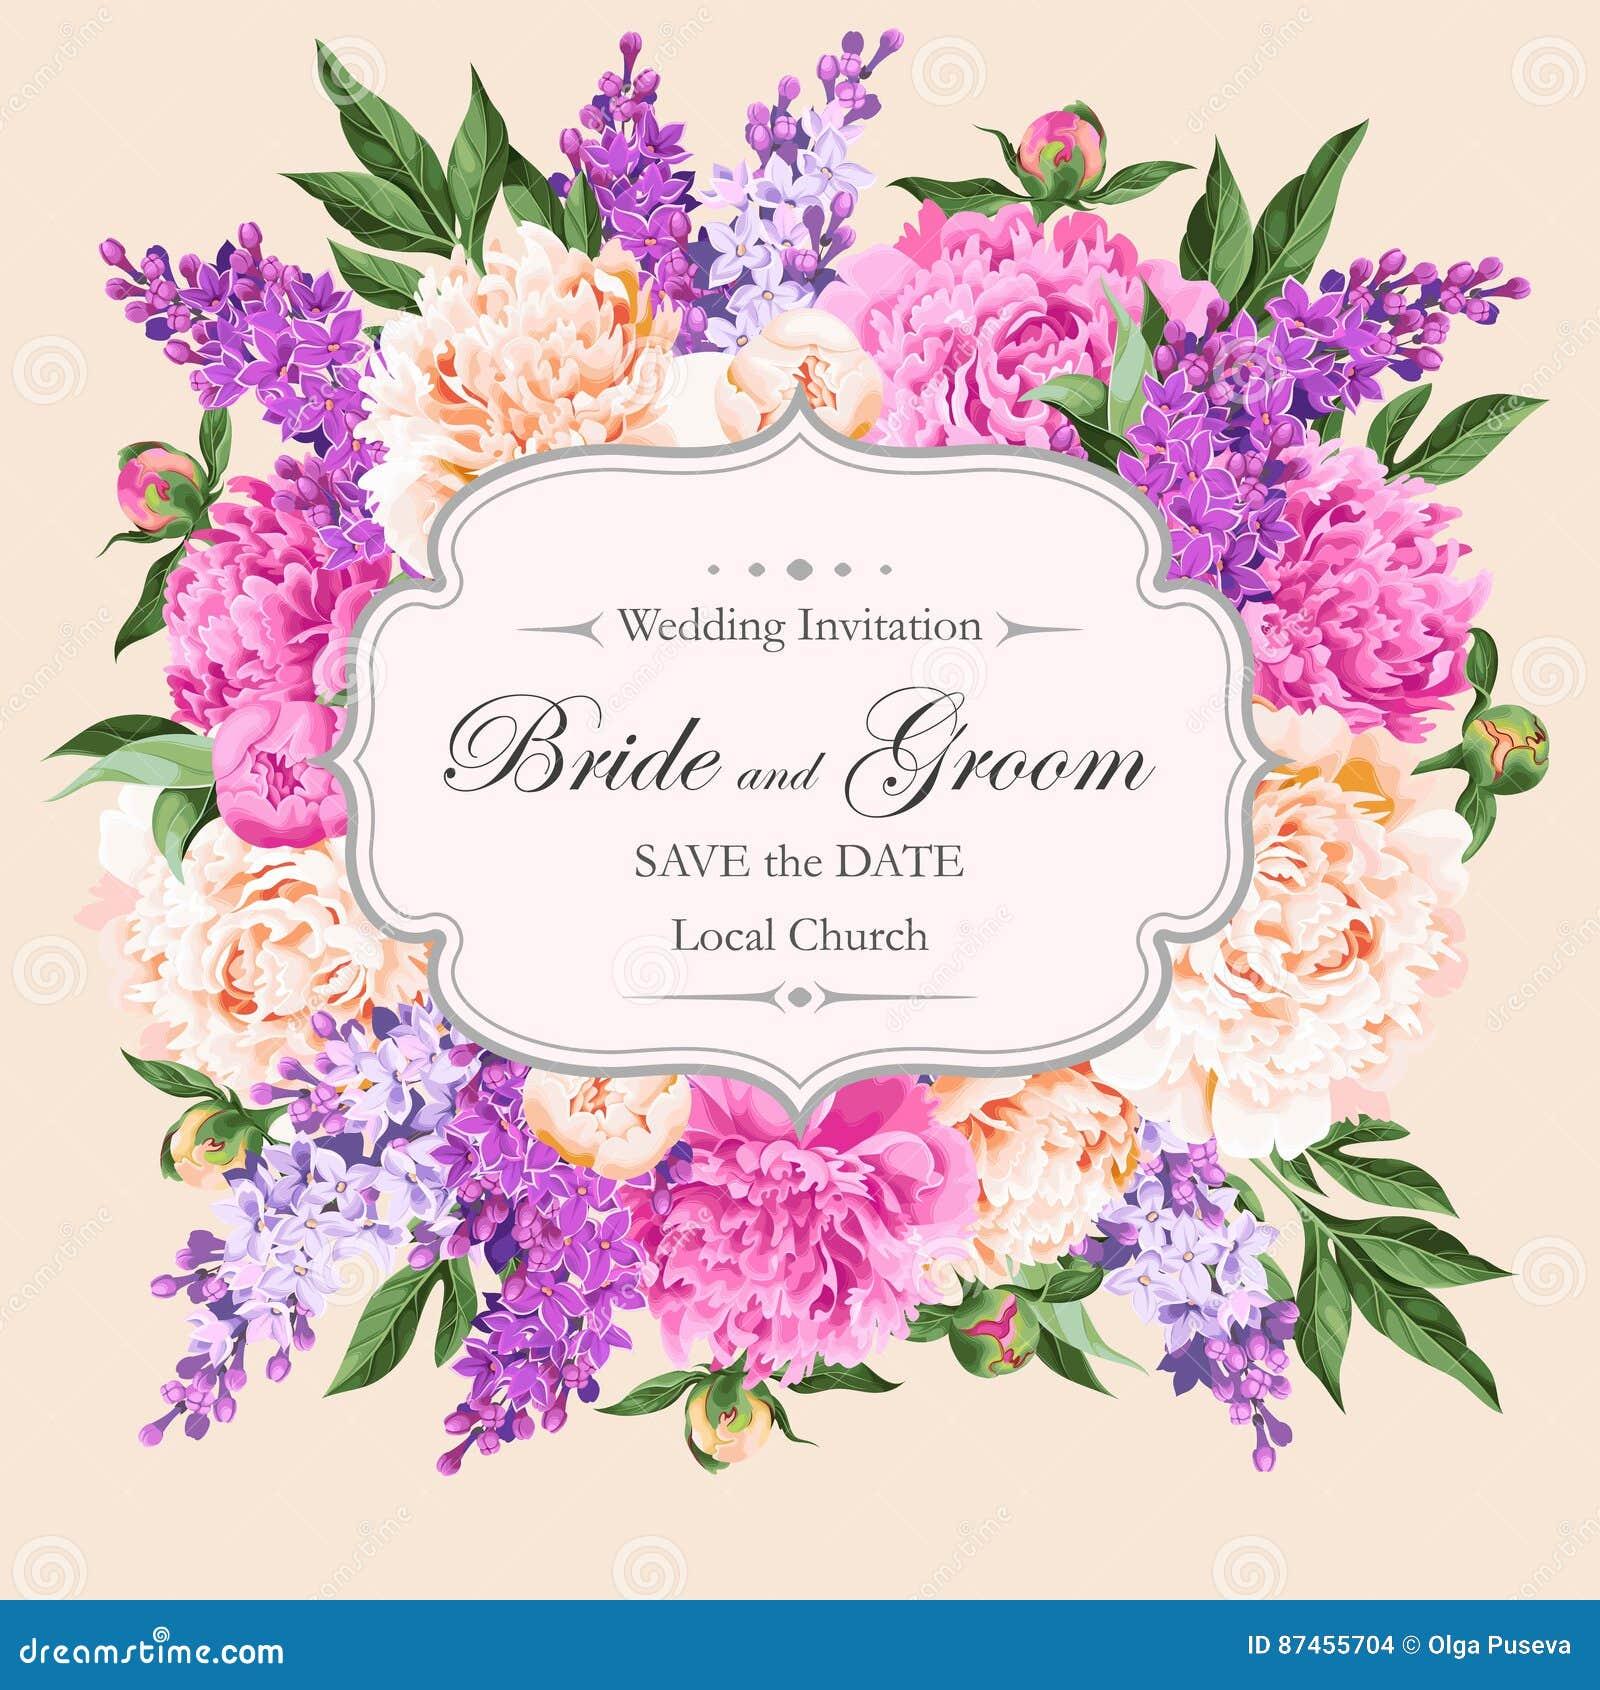 Vintage wedding invitation stock vector. Illustration of decorative ...